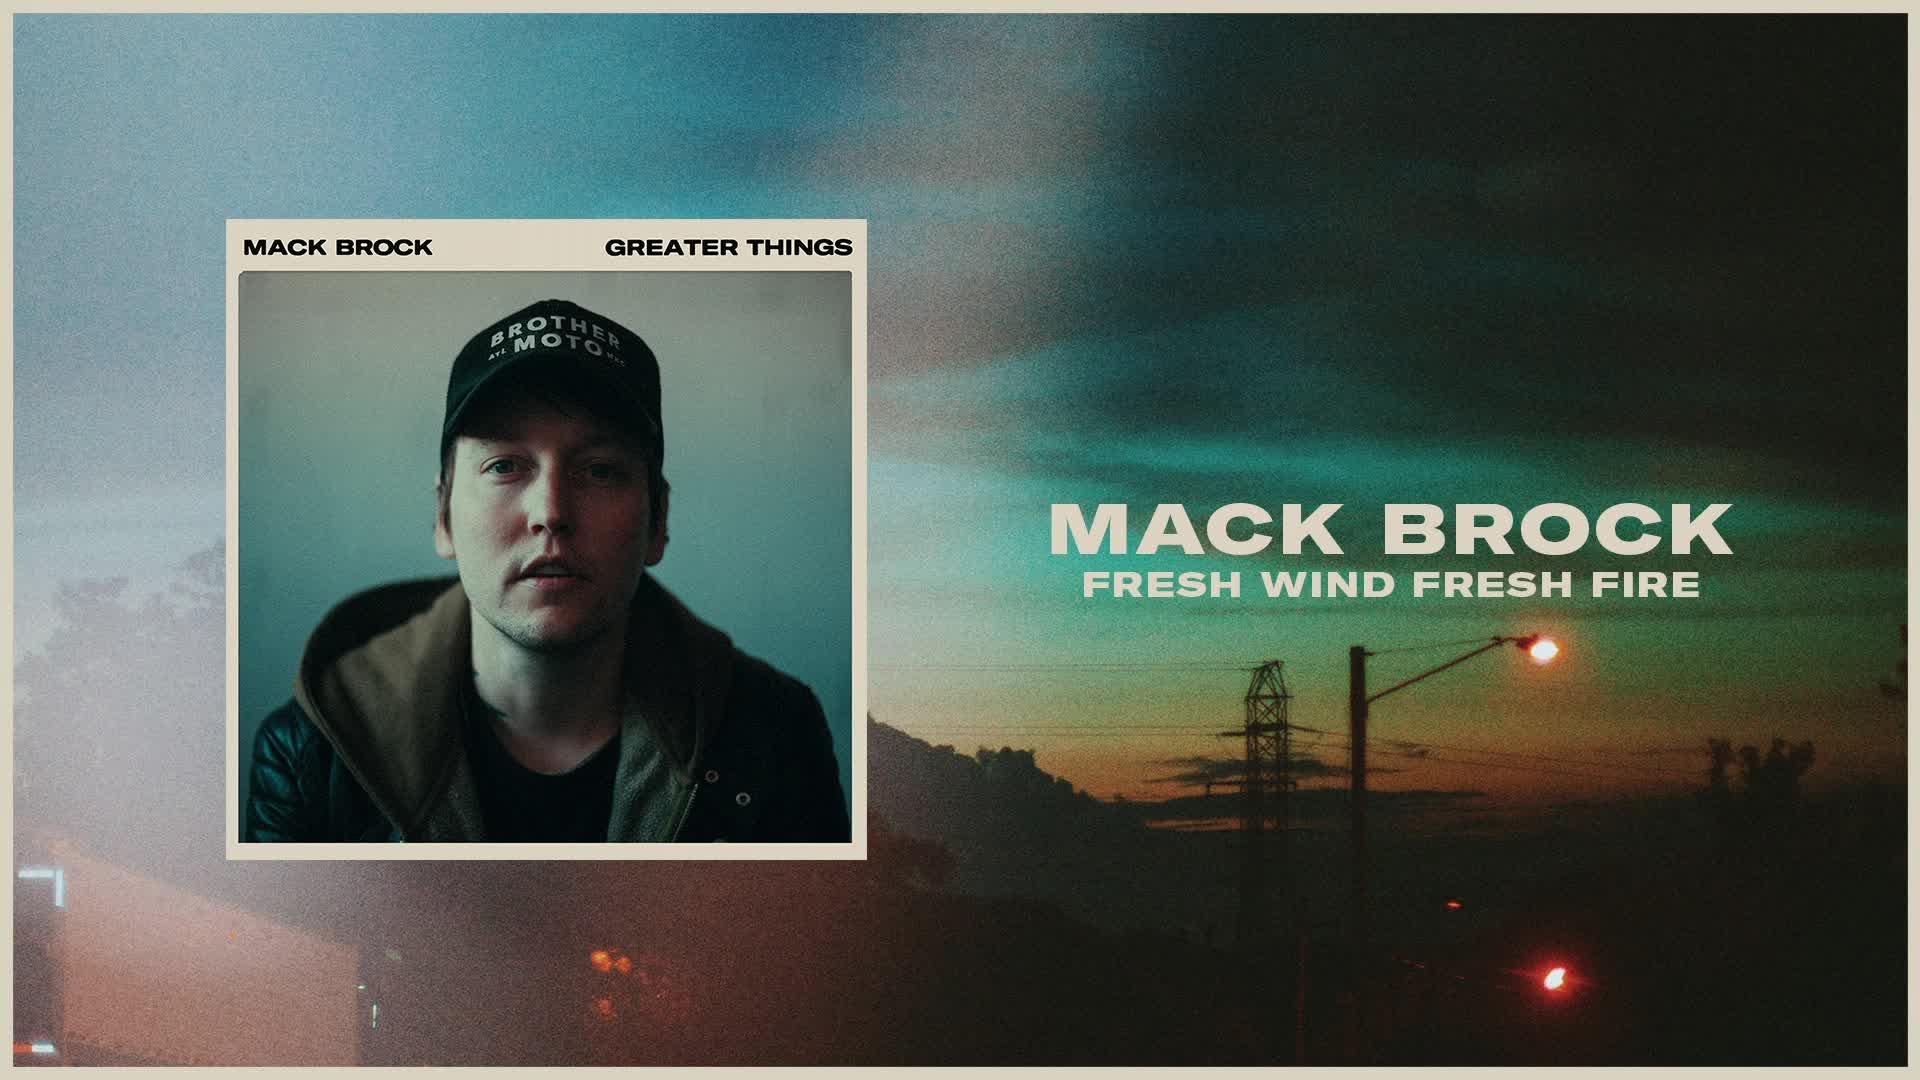 Mack Brock - Fresh Wind Fresh Fire